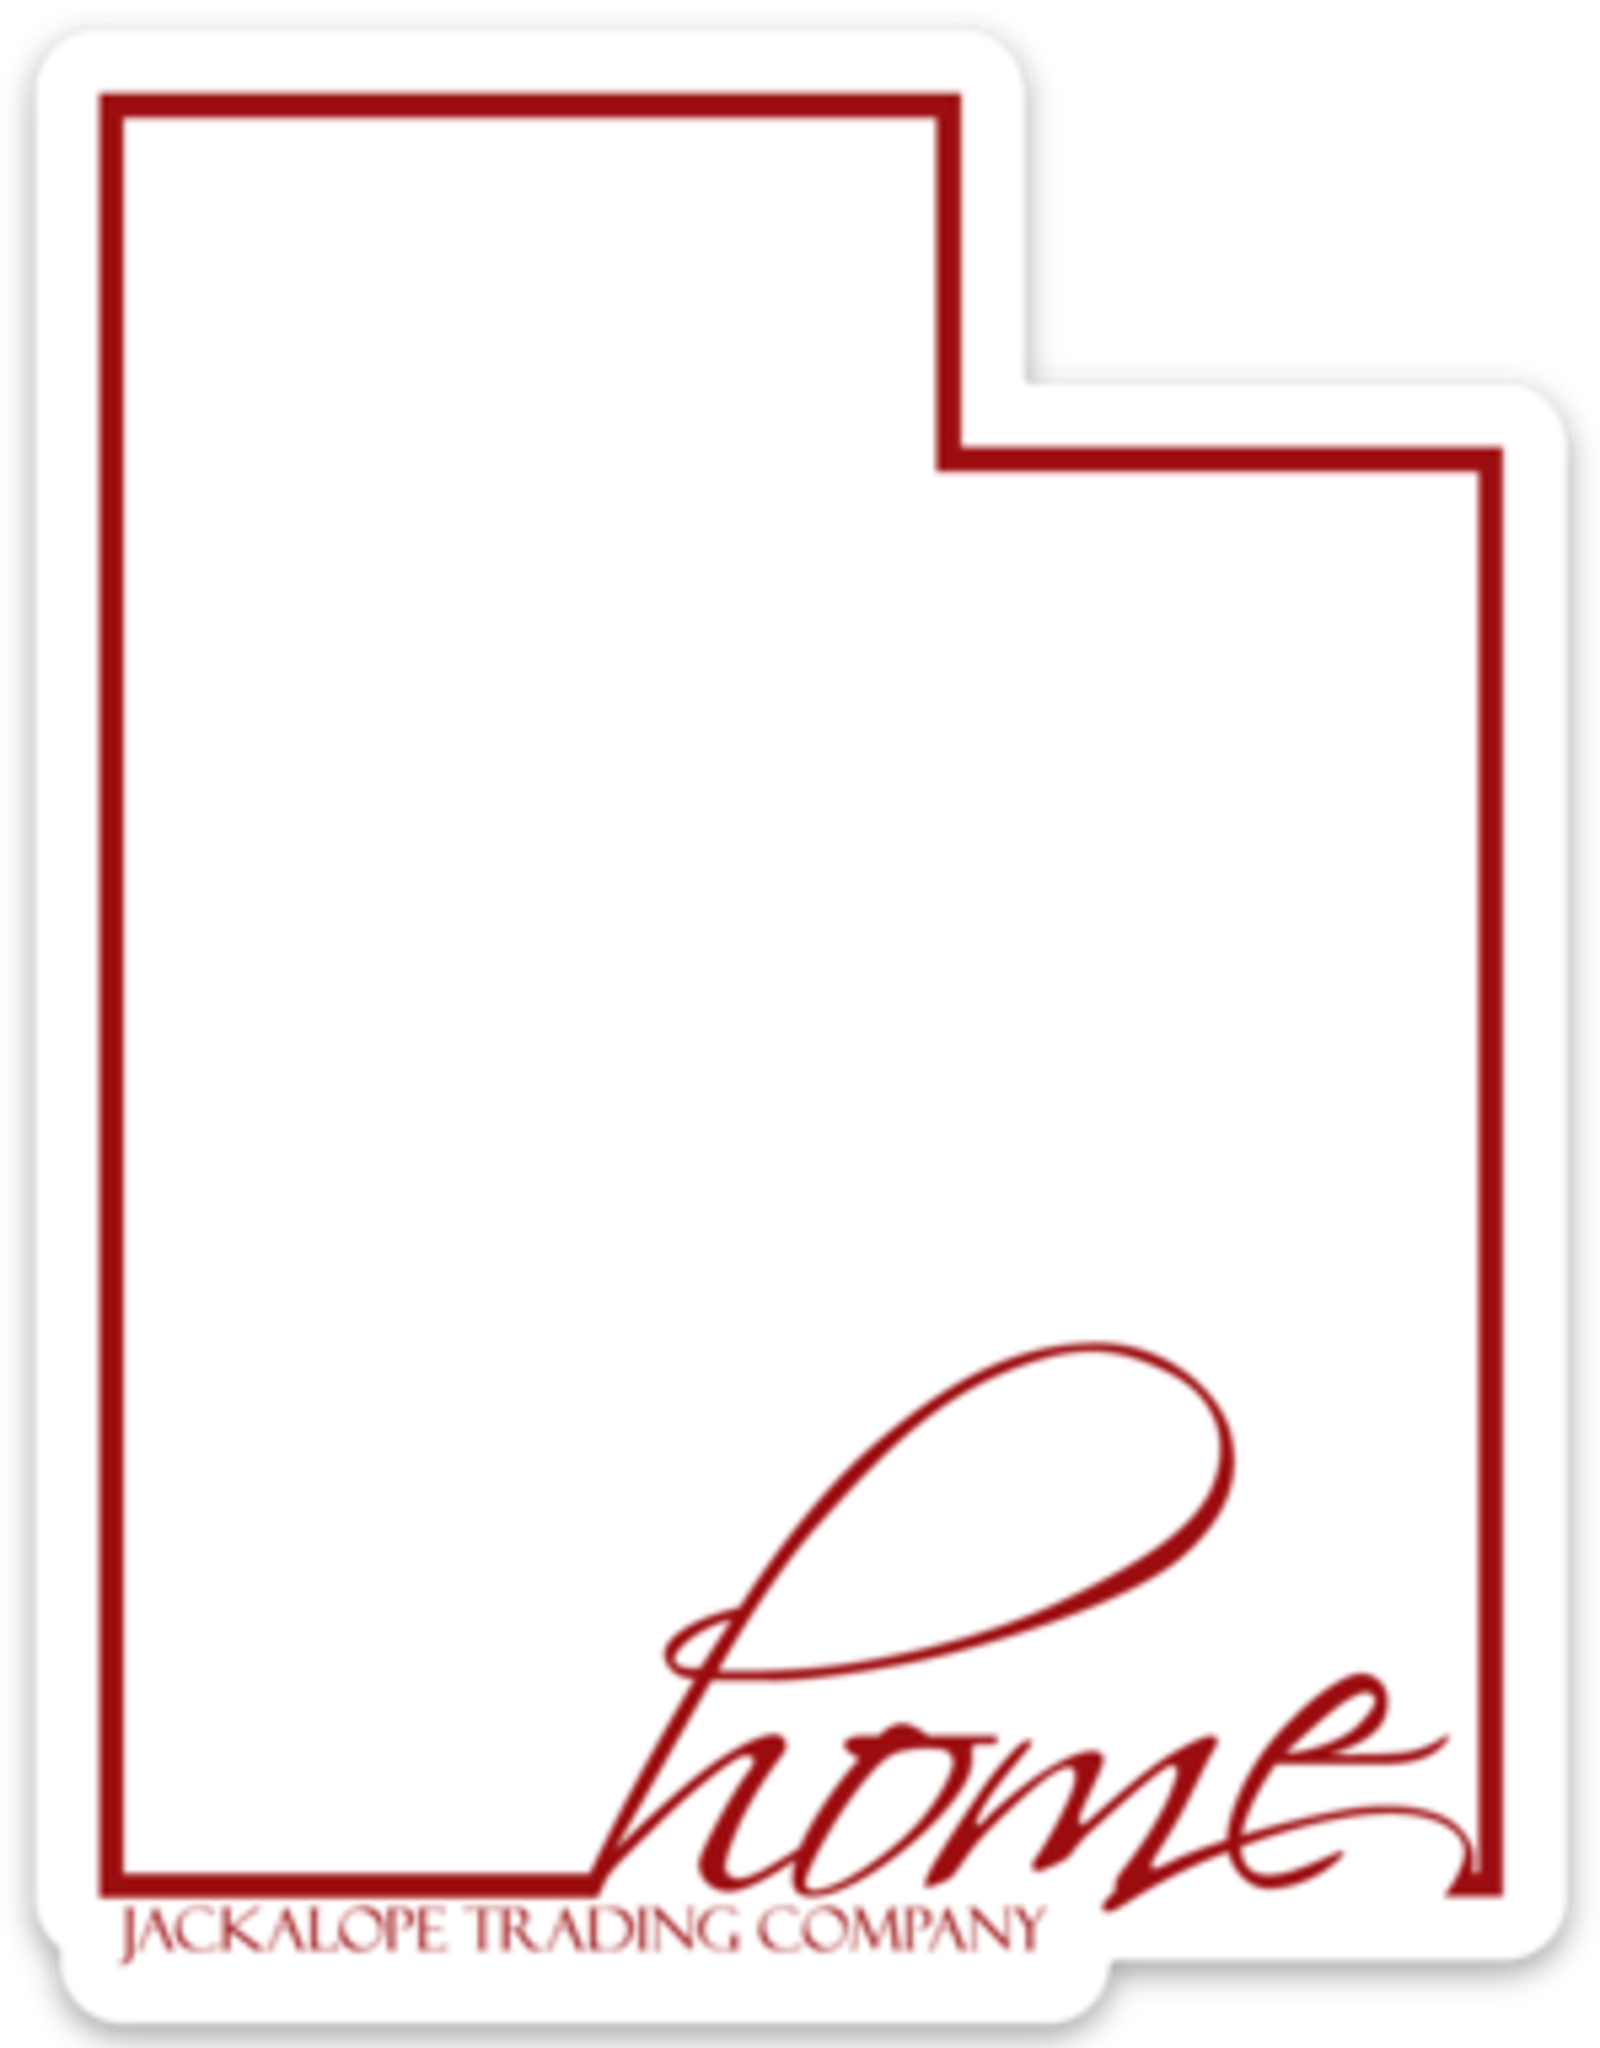 Utah Home Jackalope Stickers